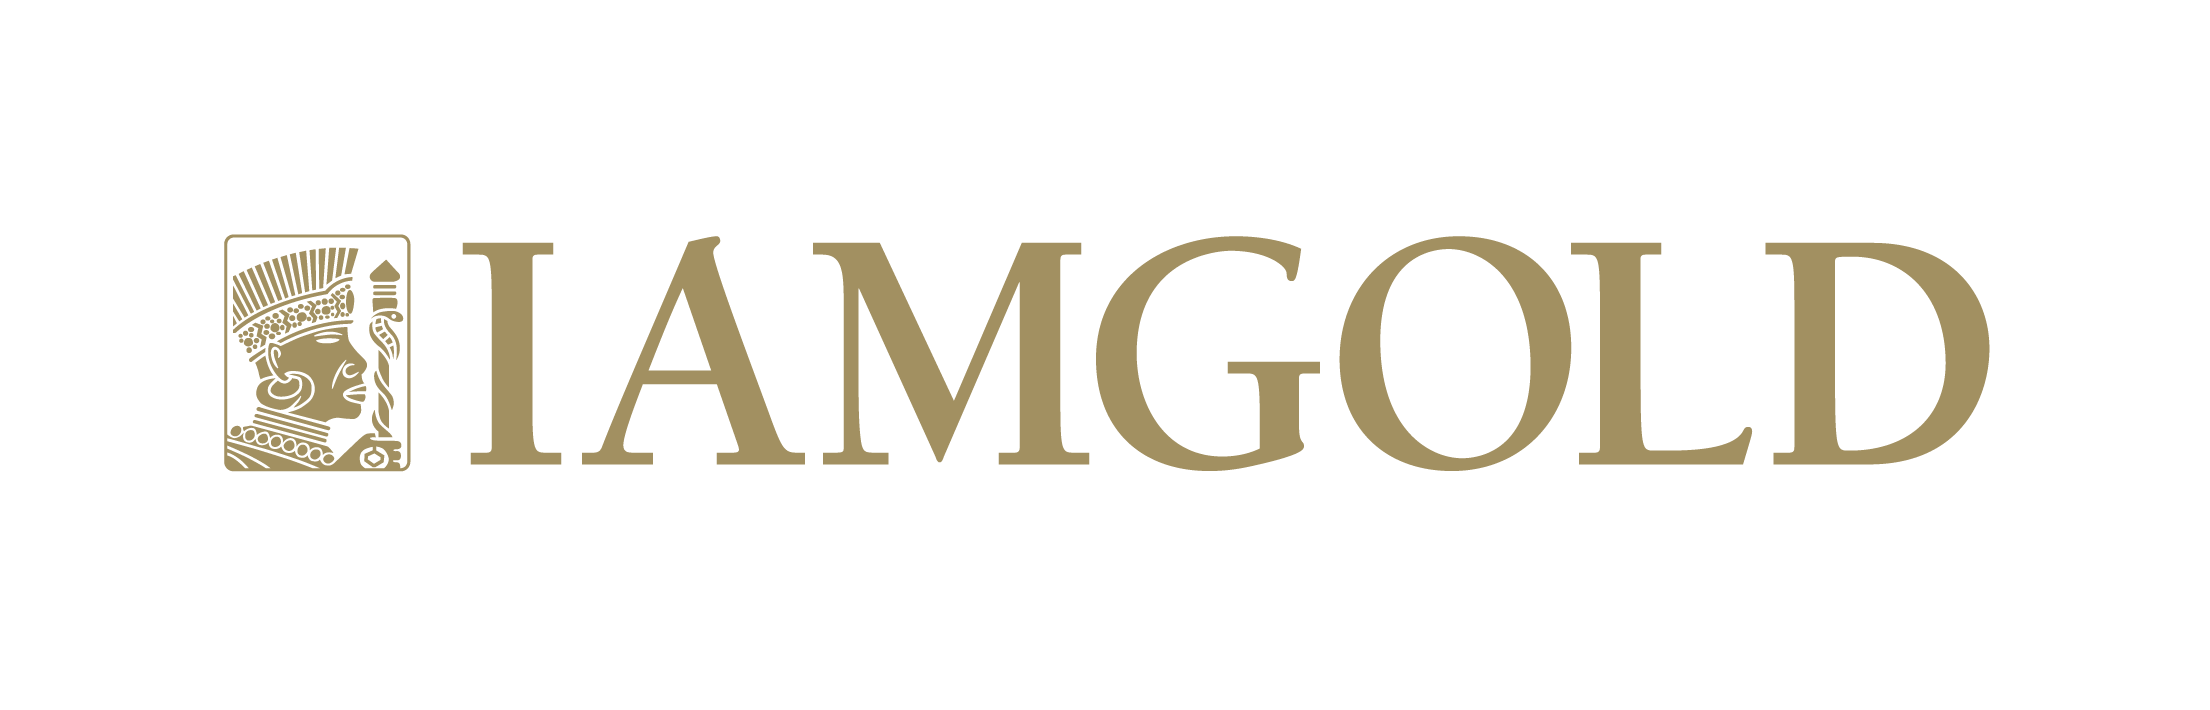 Iamgold-no-corp